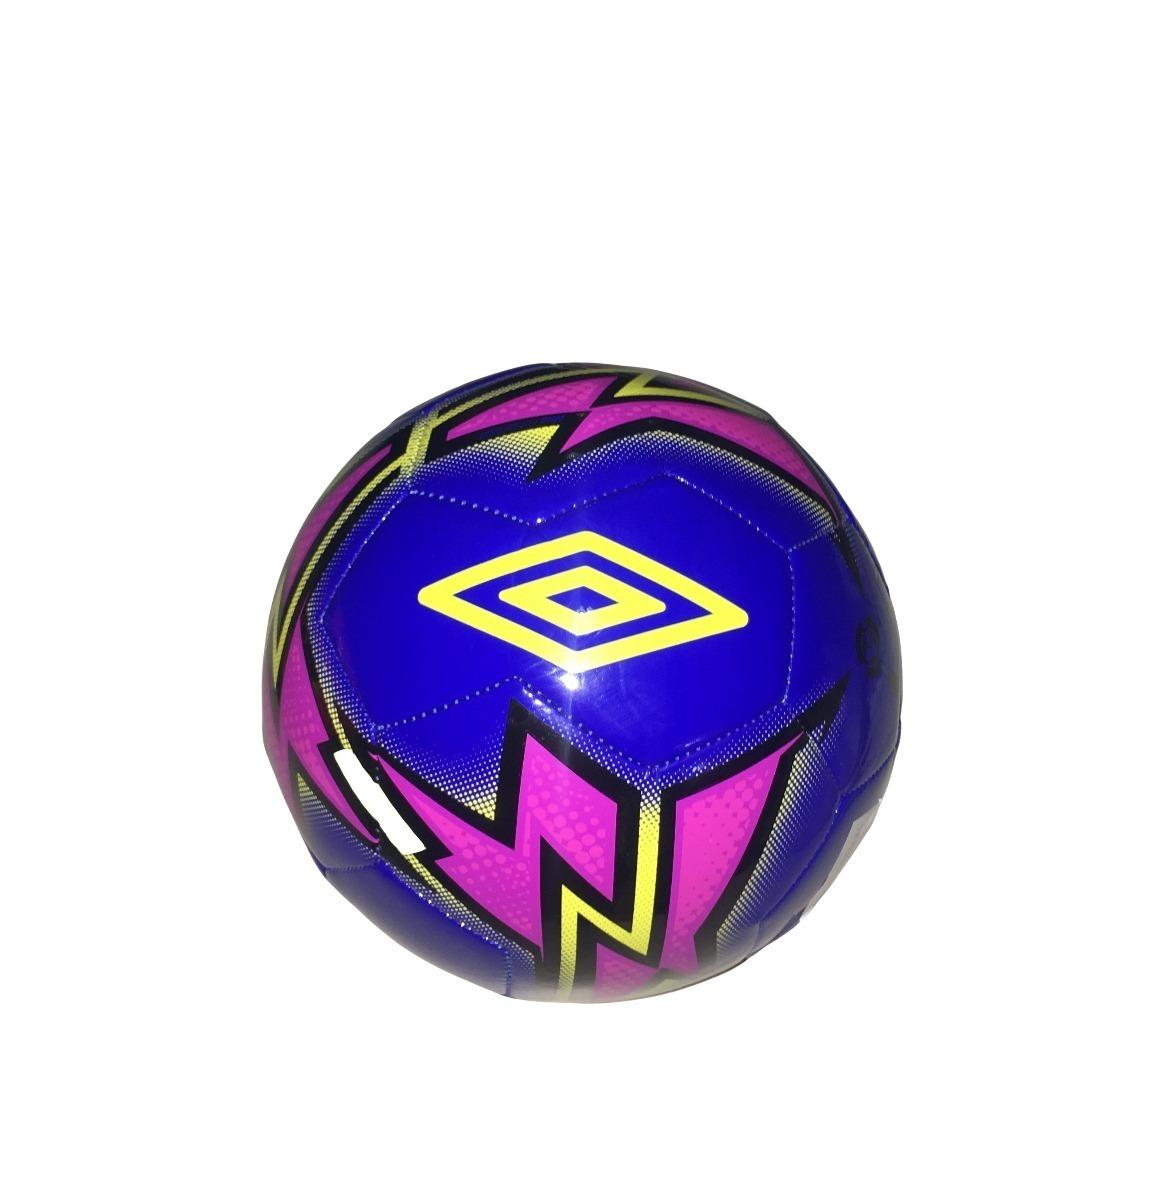 56e29b1819 pelota futbol sala umbro neo futsal liga papi medio pique n4. Cargando zoom.